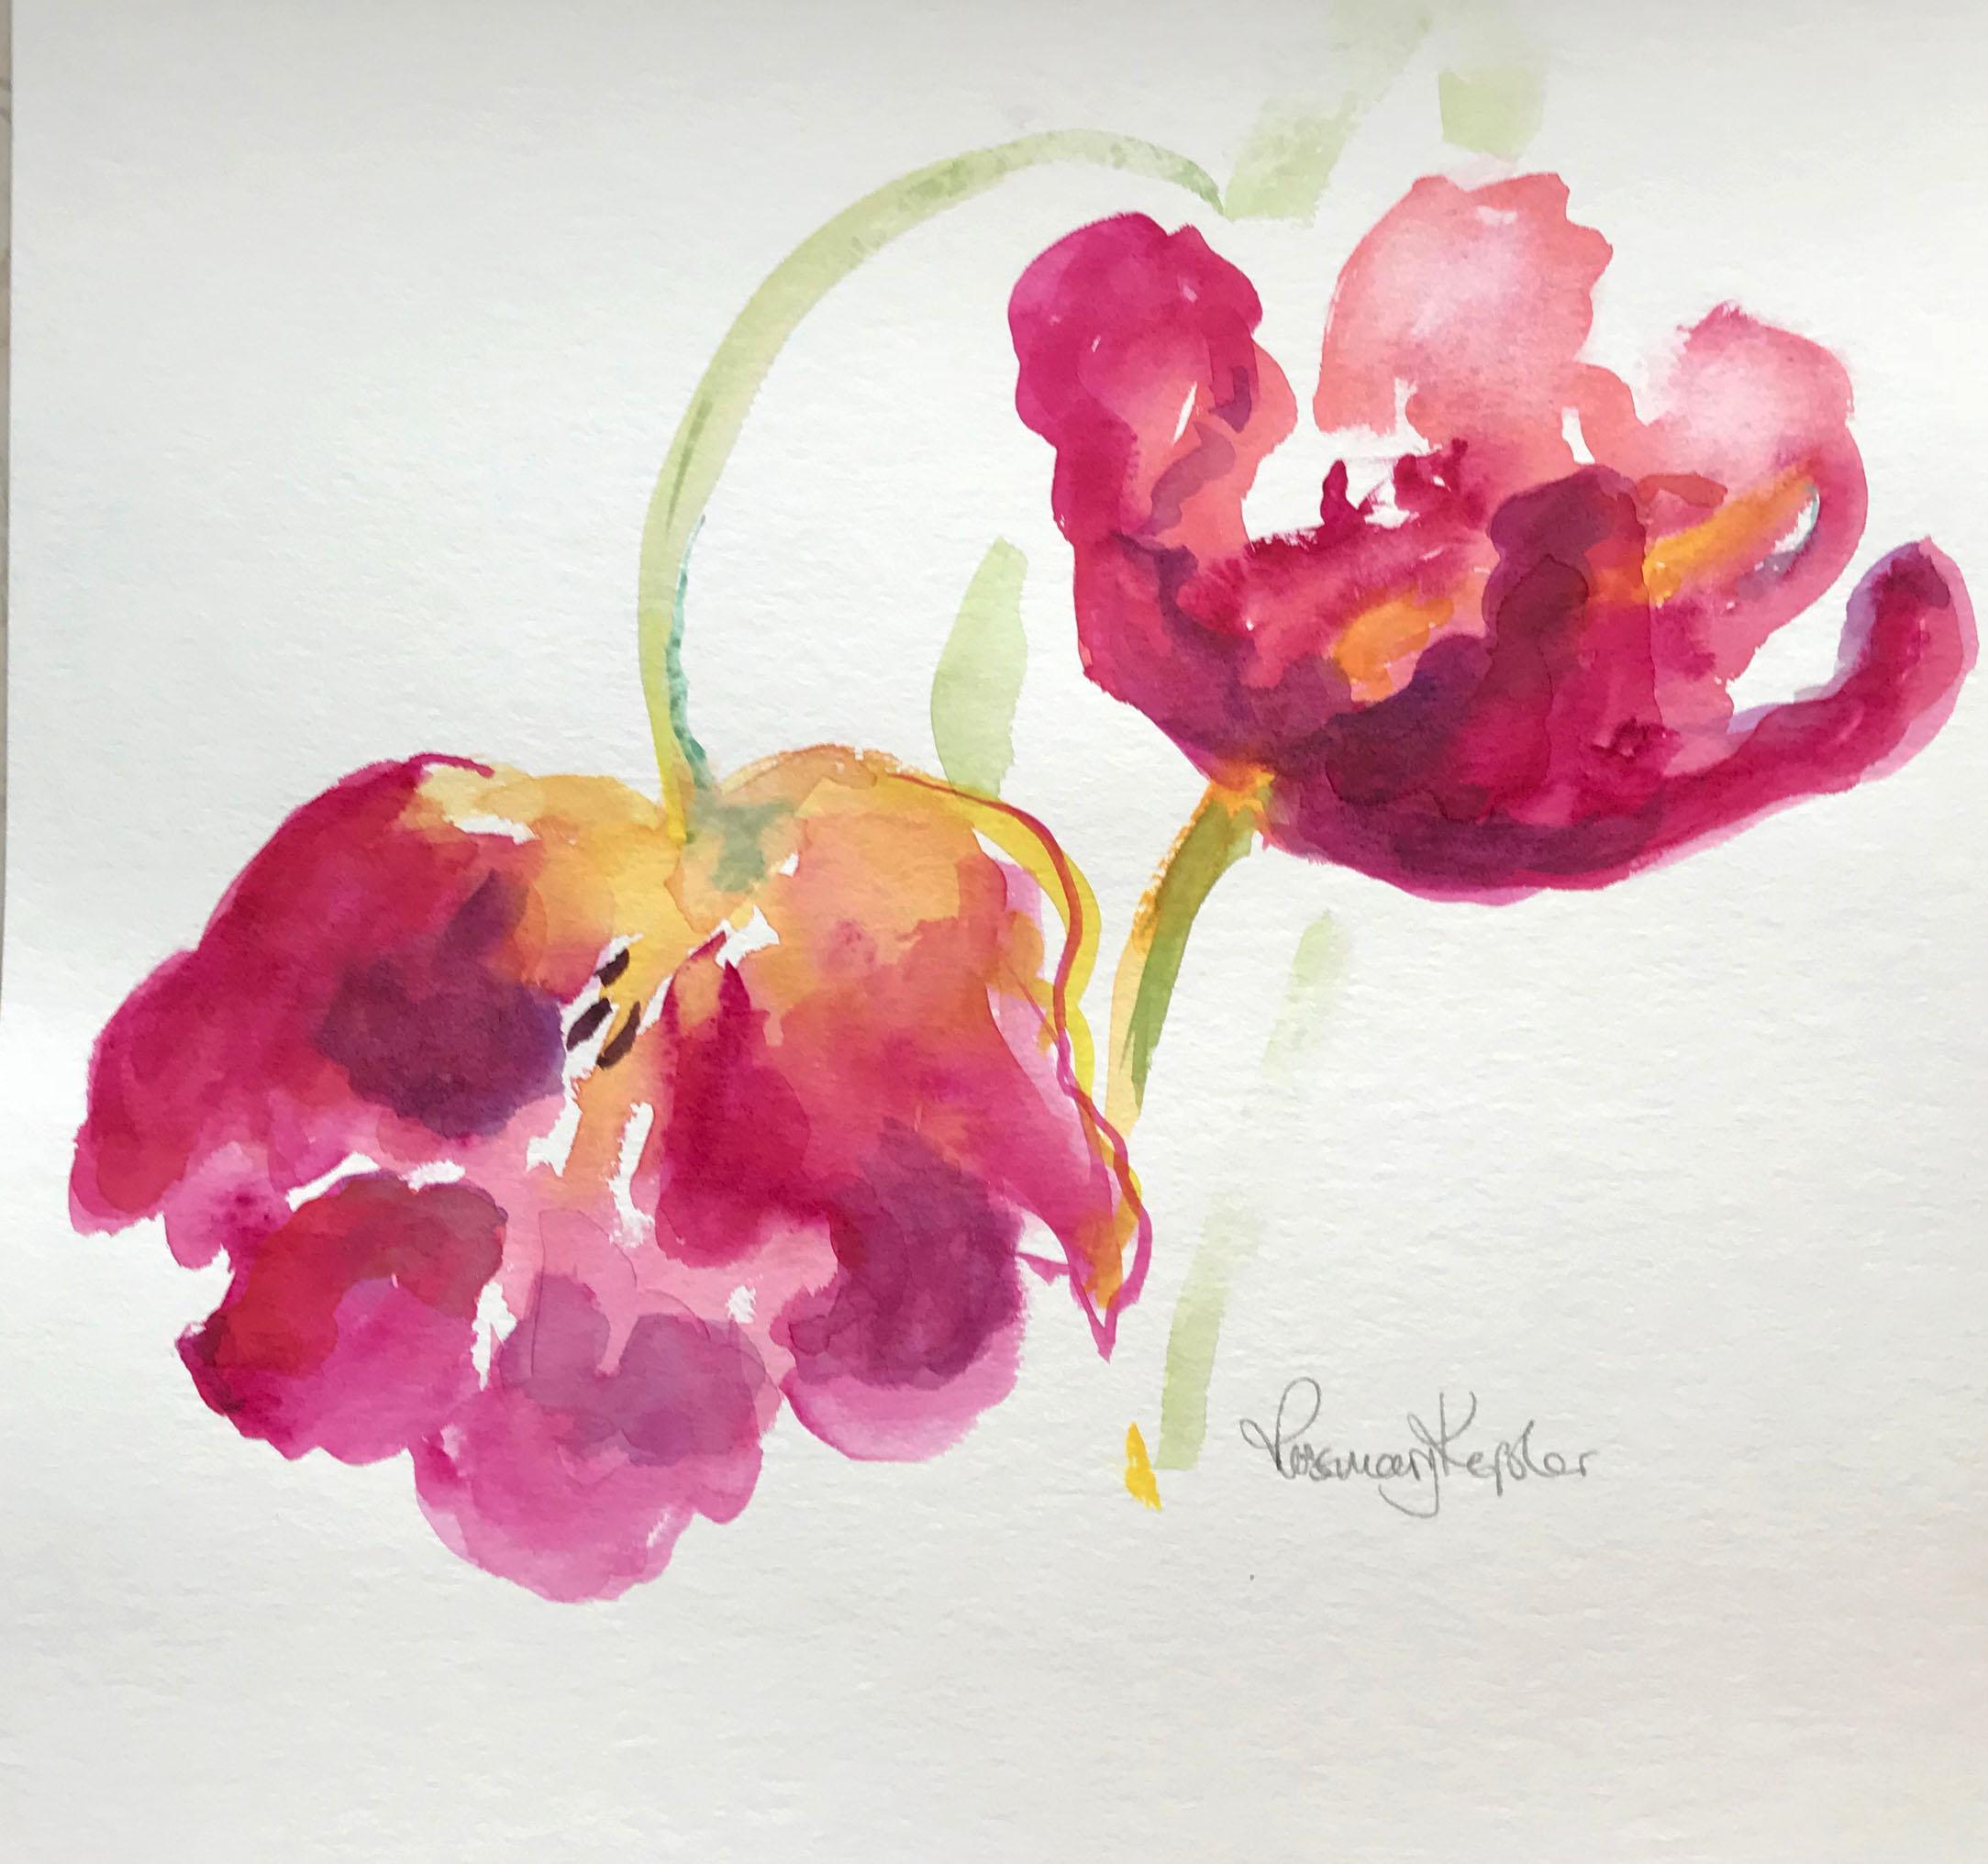 Galerie Rosemary Keßler Tulpen Malen An Einem Grauen Januar Tag